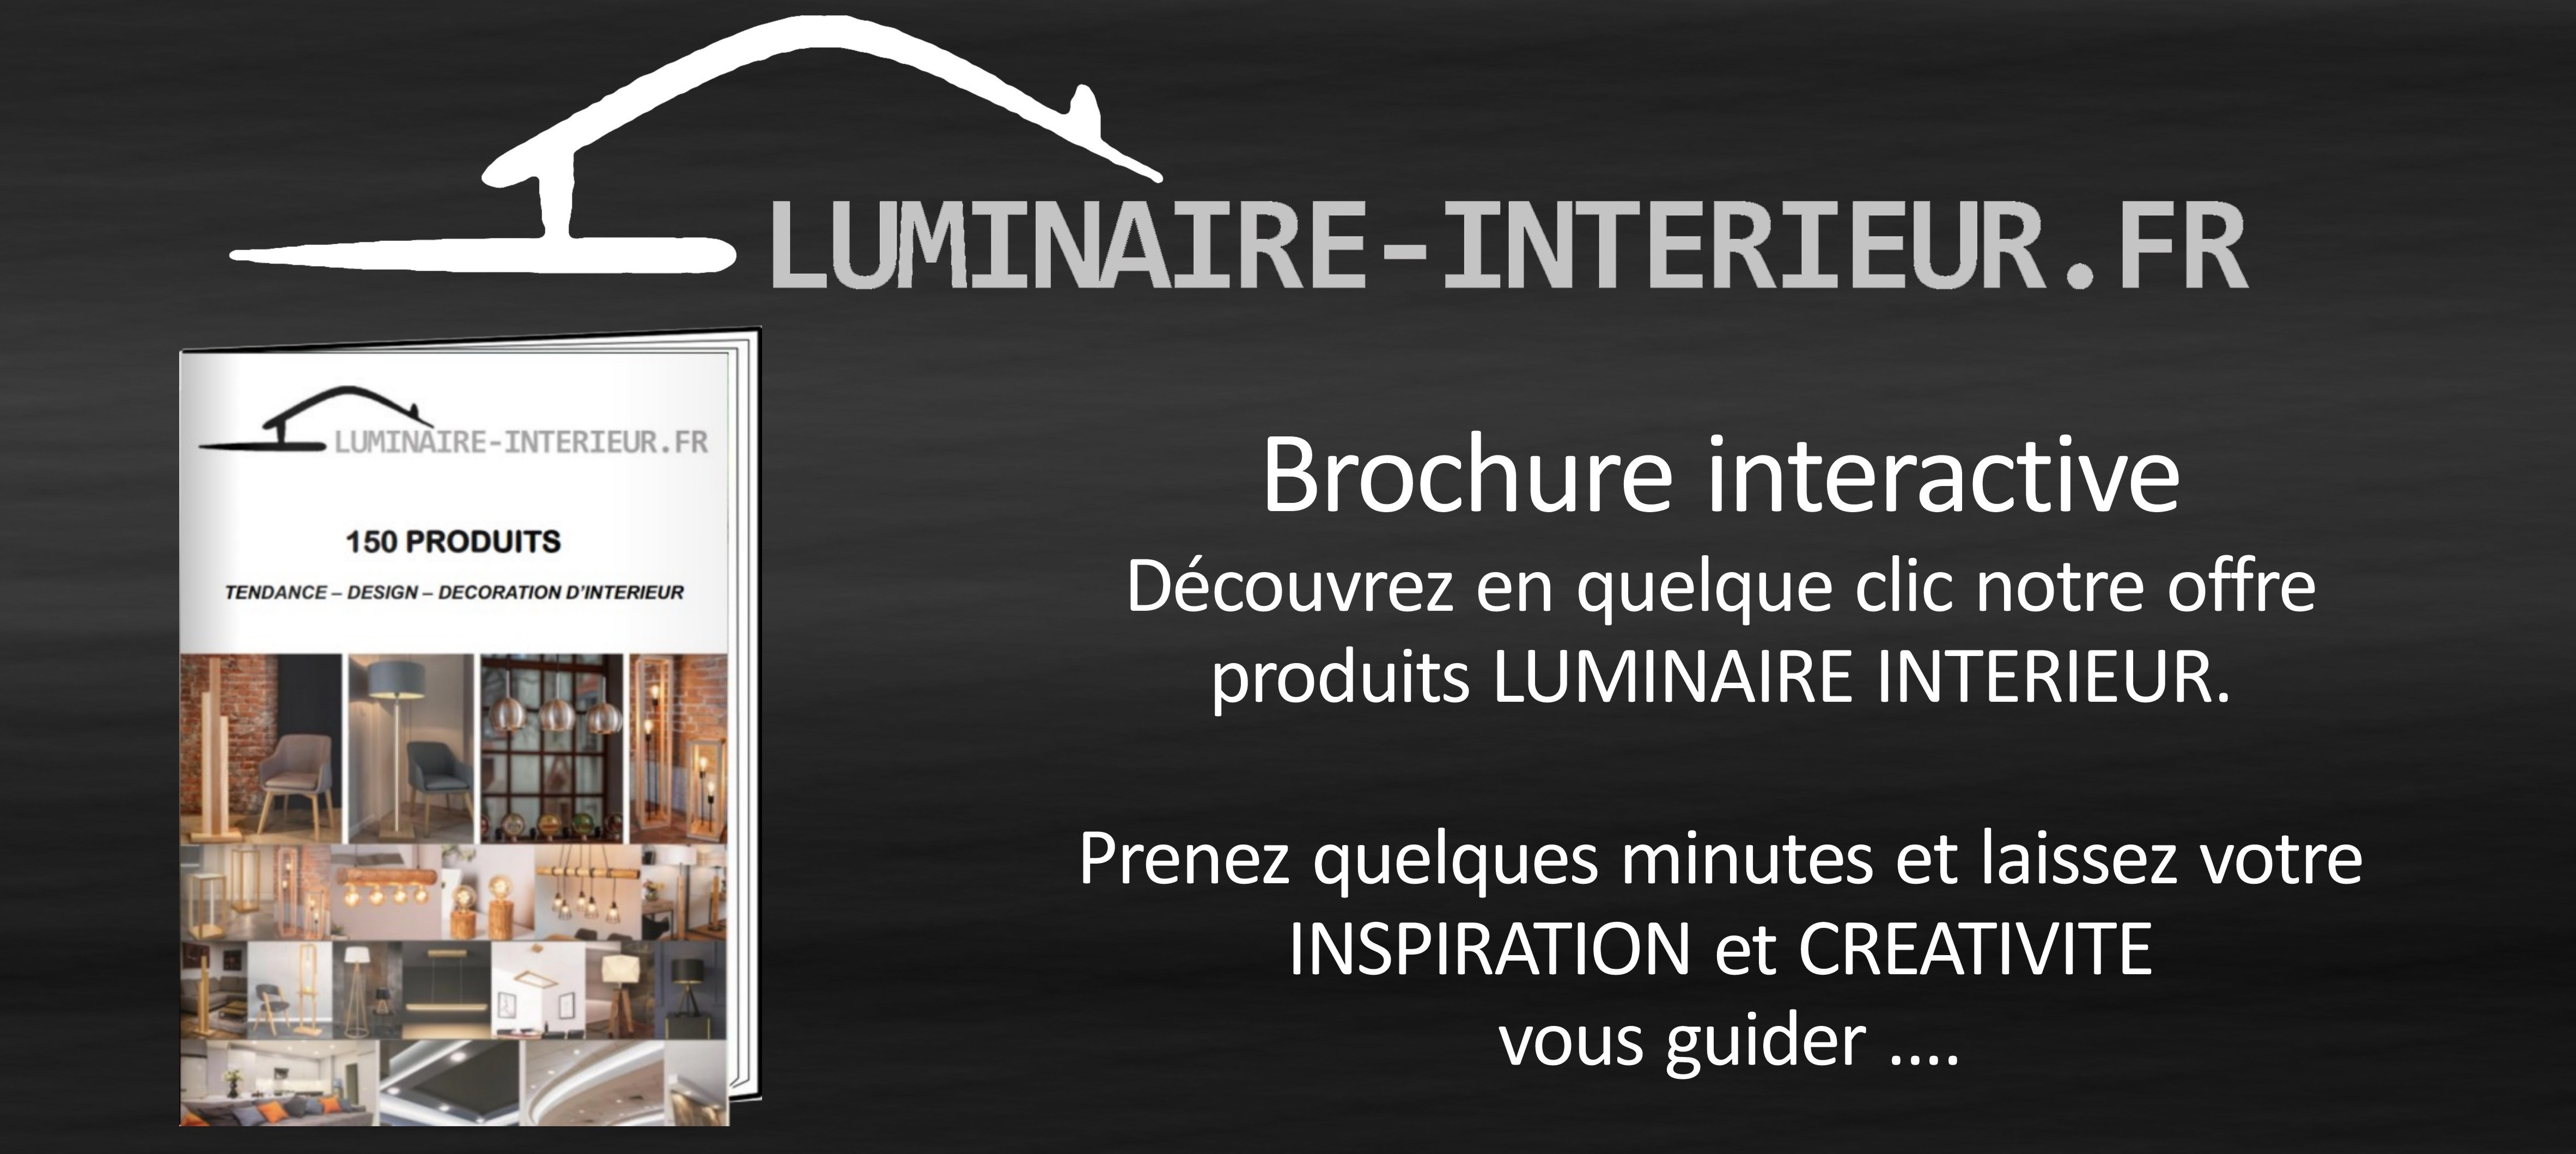 Luminaire Interieur Brochure